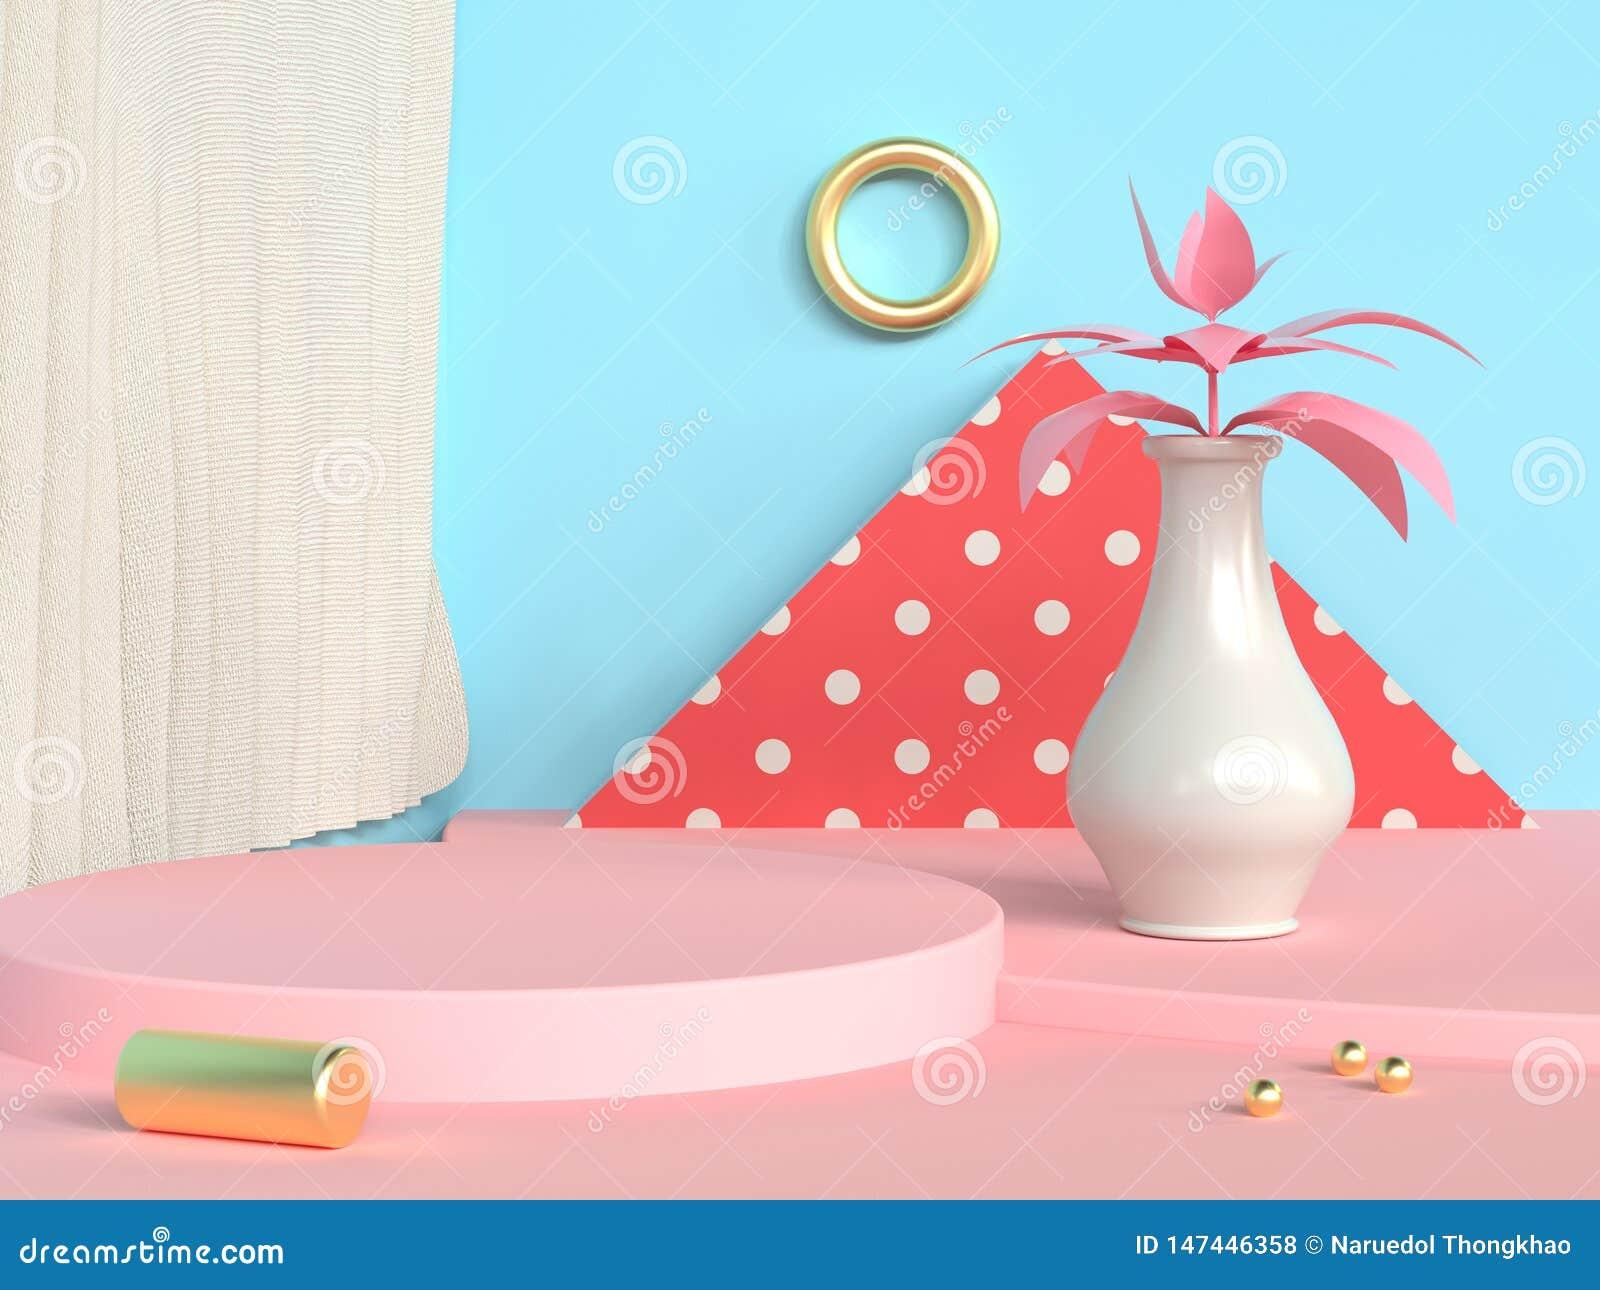 blank circle podium abstract scene blue wall pink floor tree pot/jar 3d render